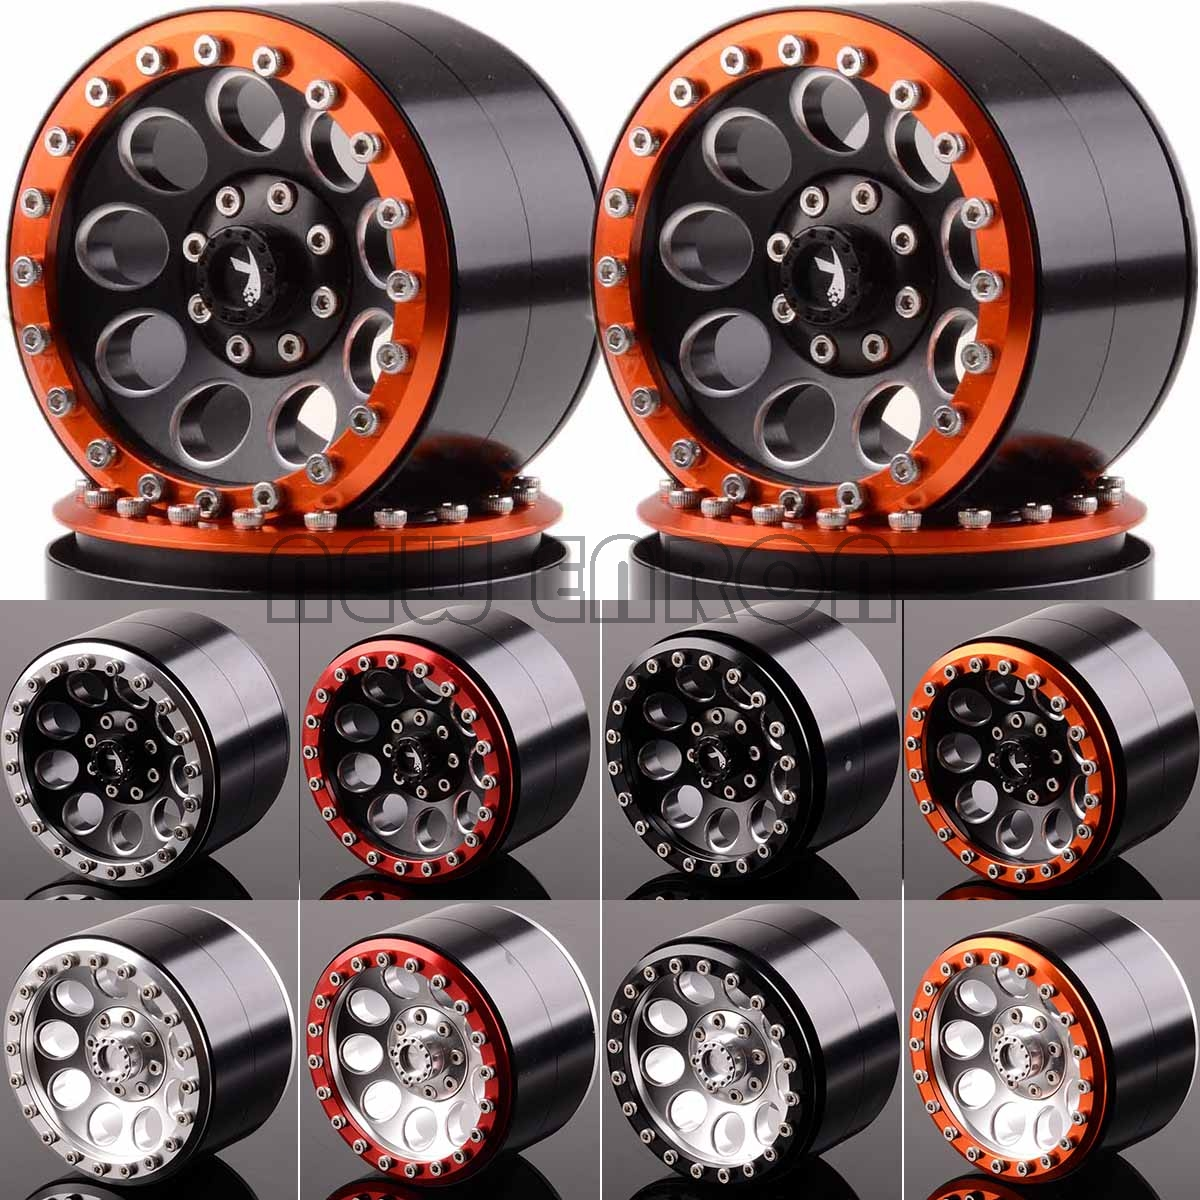 NEW ENRON 4P Aluminum 2.2 Inch Beadlock Wheel Rim Hub Fit FOR RC Rock Crawler Axial SCX10 RR10 Wraith 90048 90018 TRX4 TRX-4 KM2